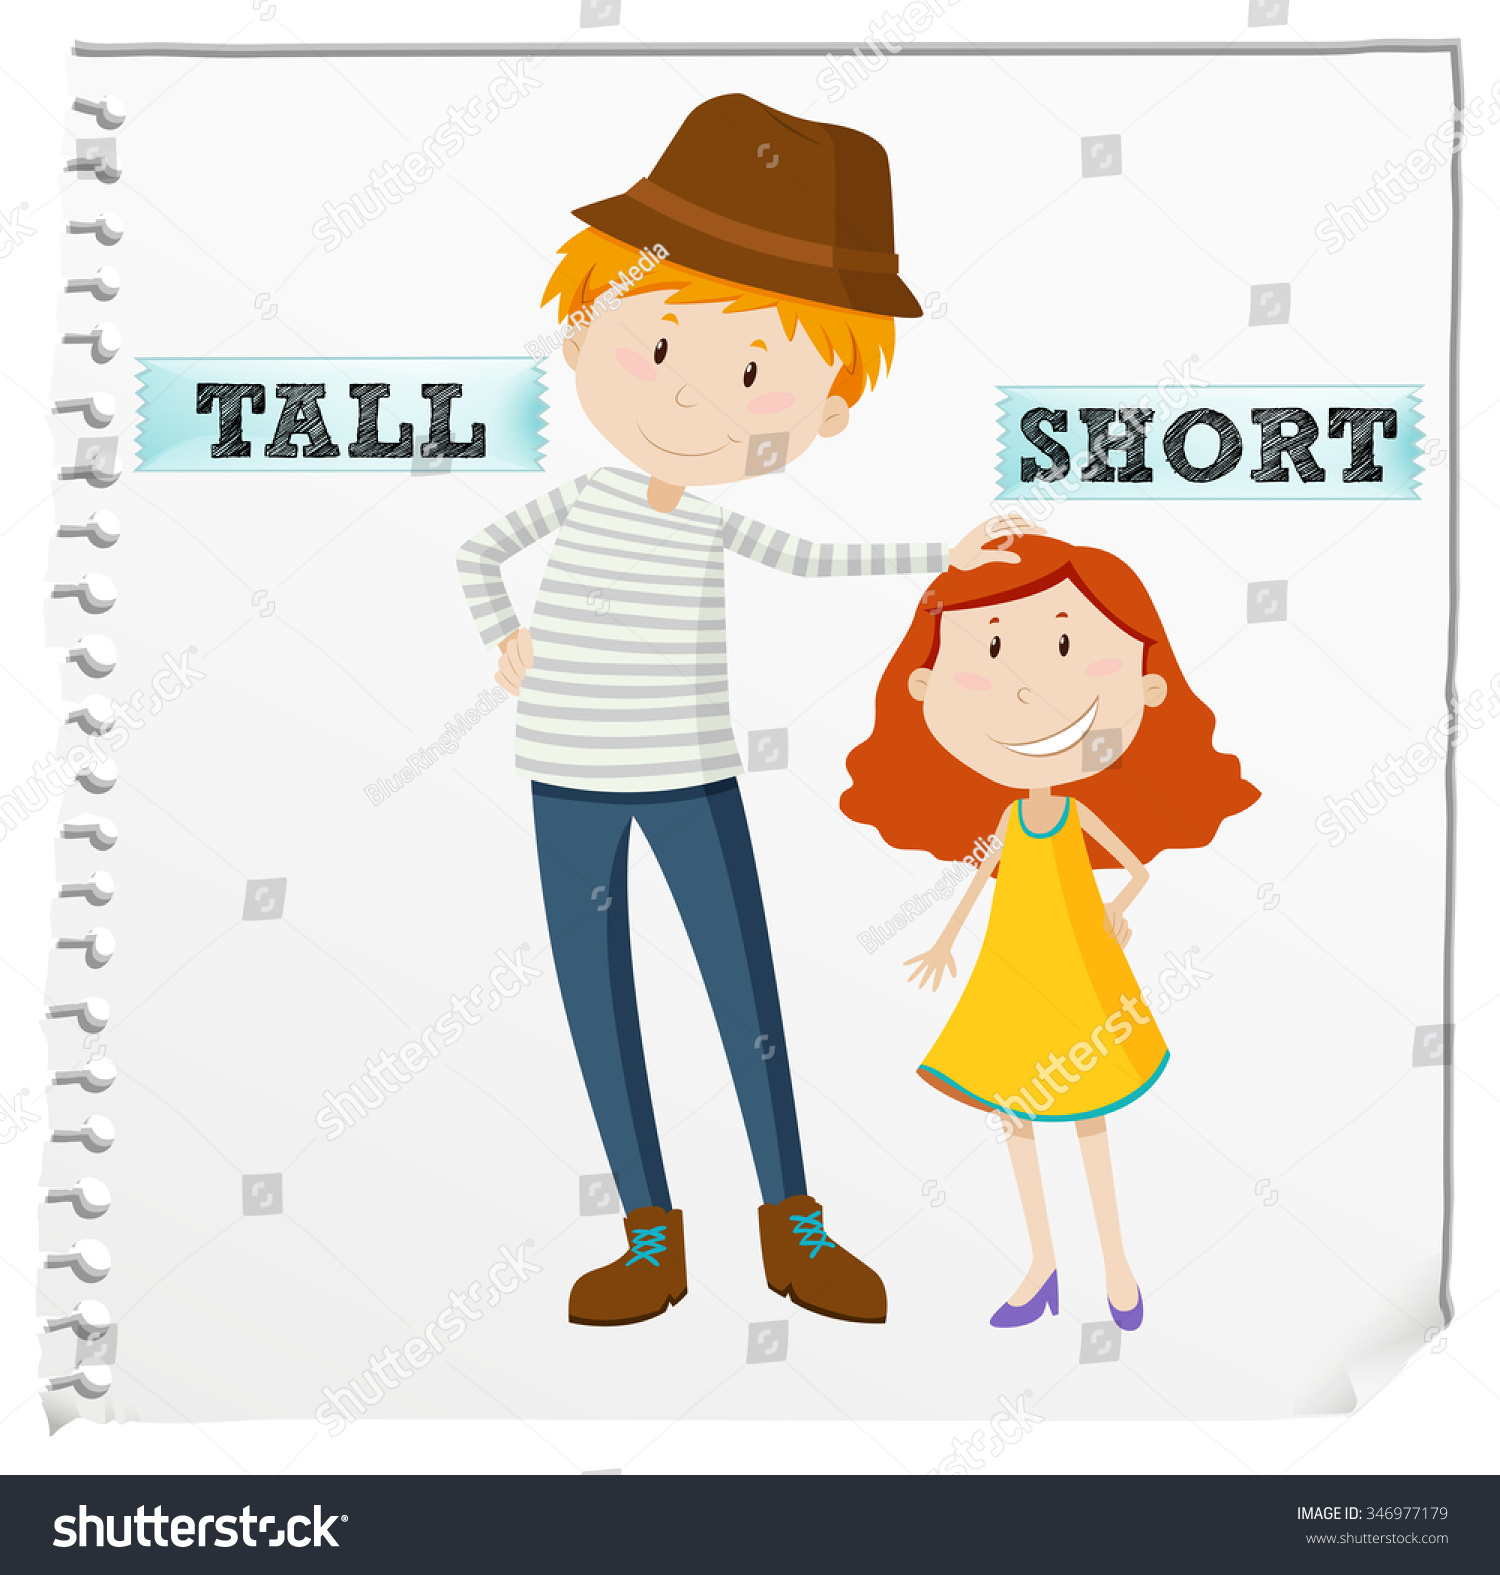 Opposite Adjectives Tall Short Illustration Stock Vector